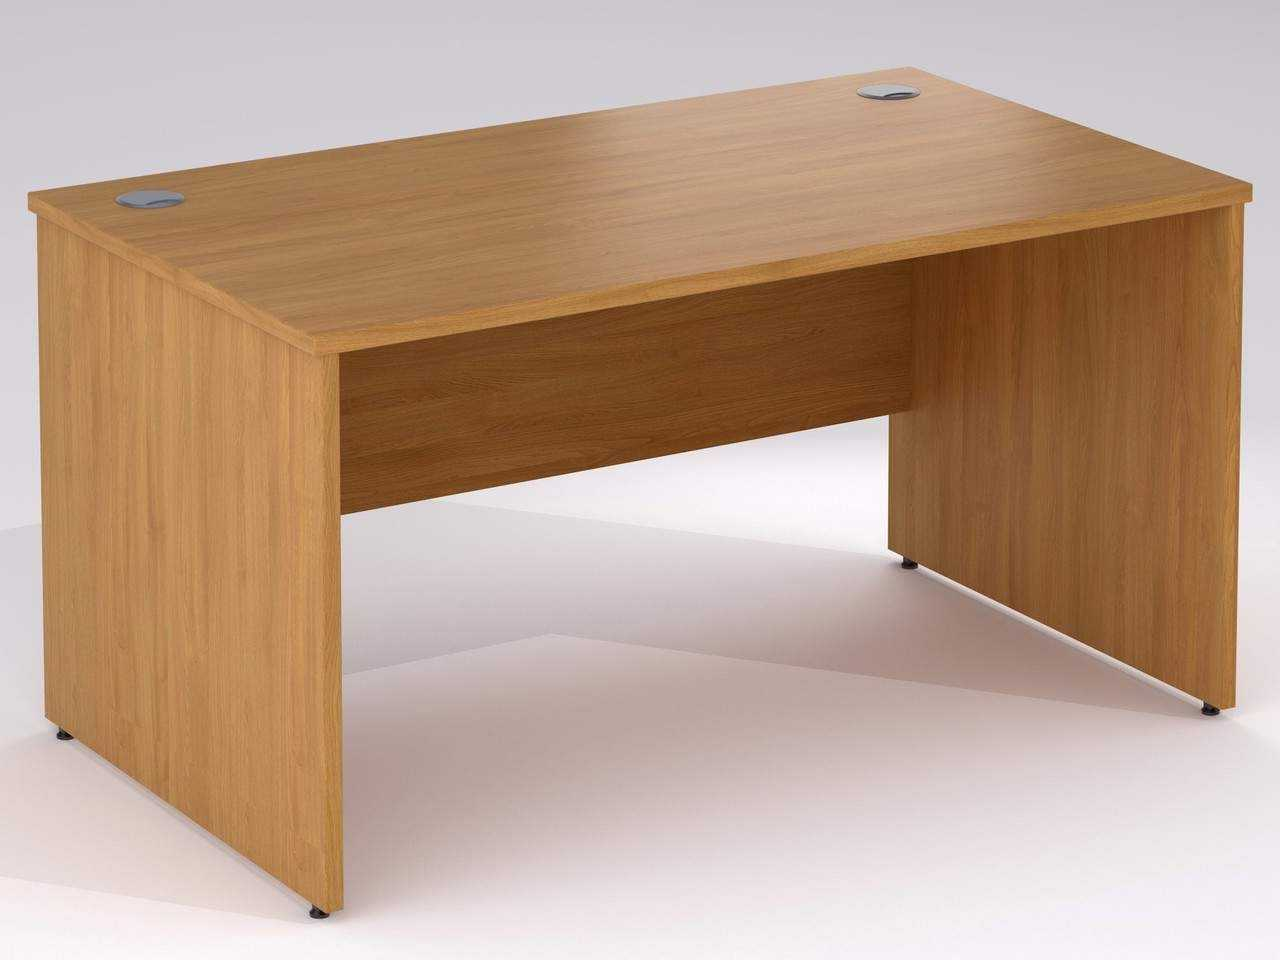 TCS nTree Rectangular Panel End Office Desk